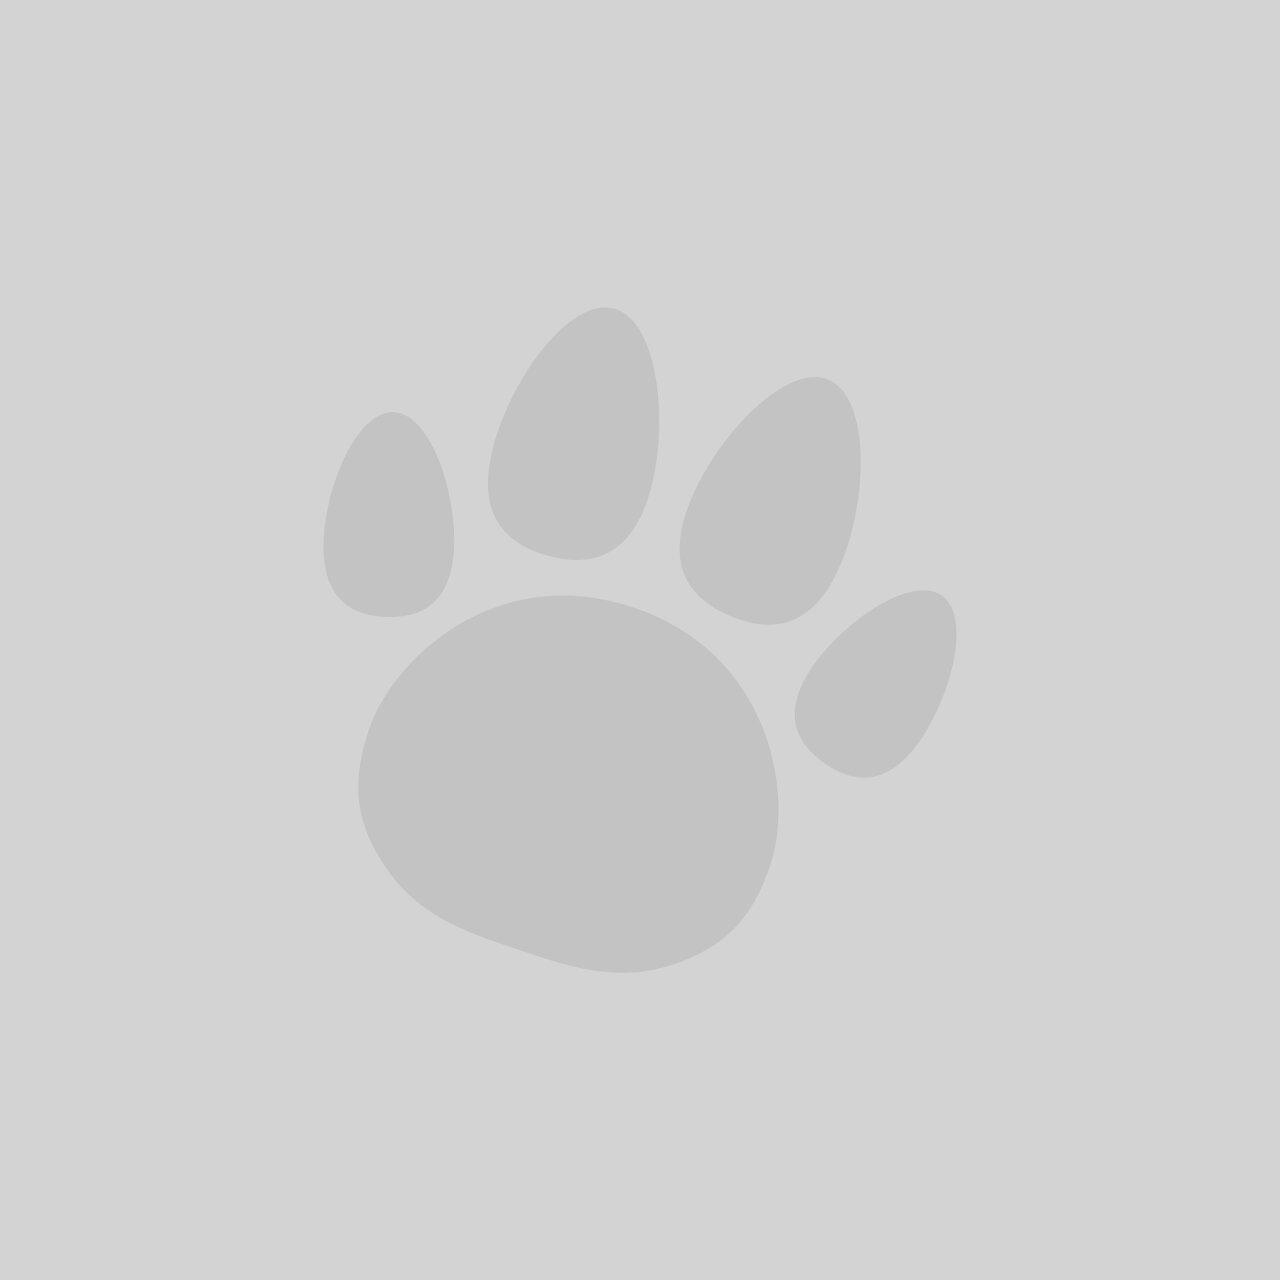 Drontal Dog Tasty Bone Worming Tablets x 2